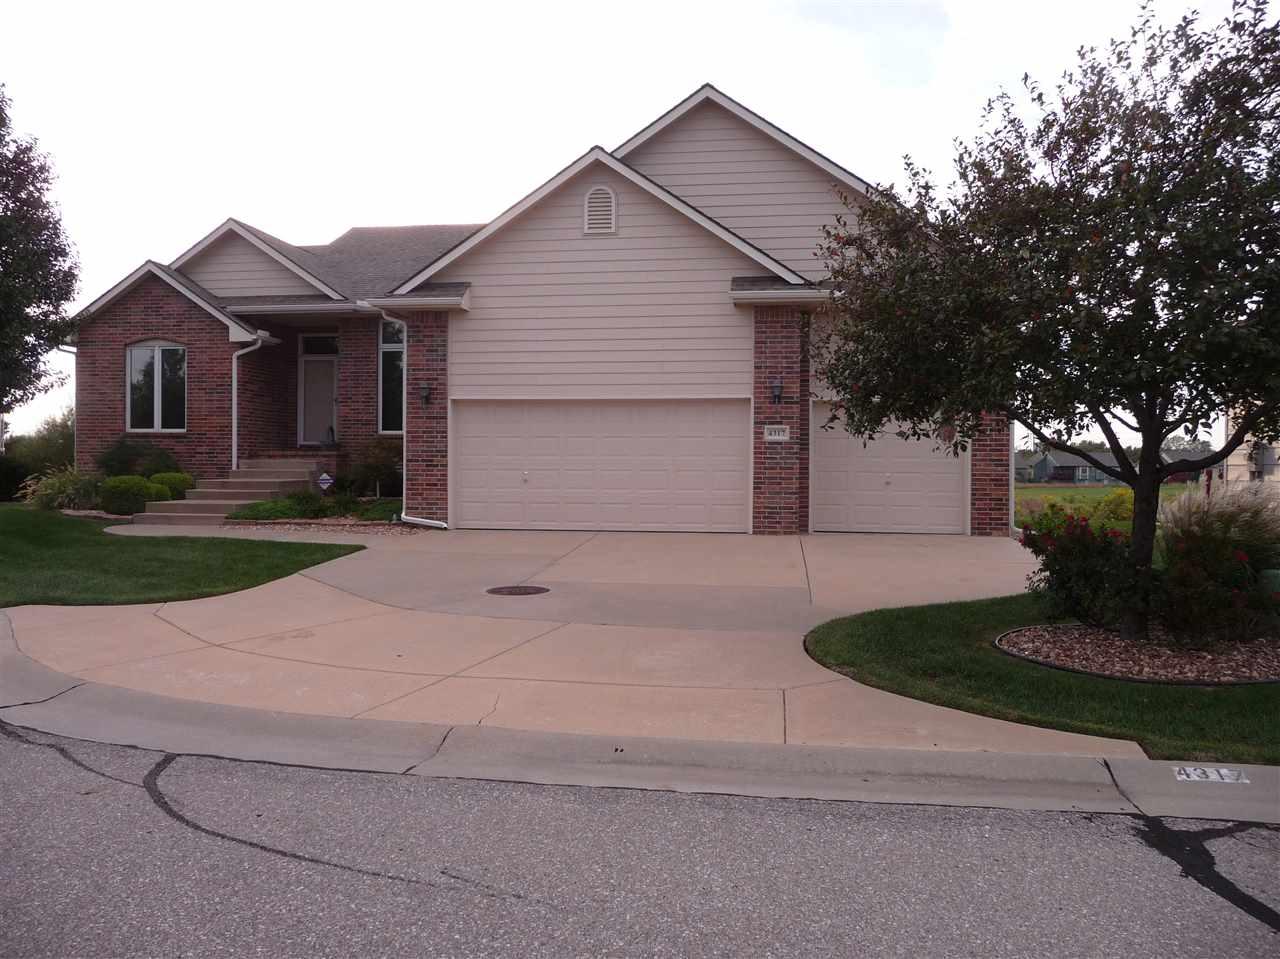 4317 N Cherry Hill CR, Wichita, KS 67226